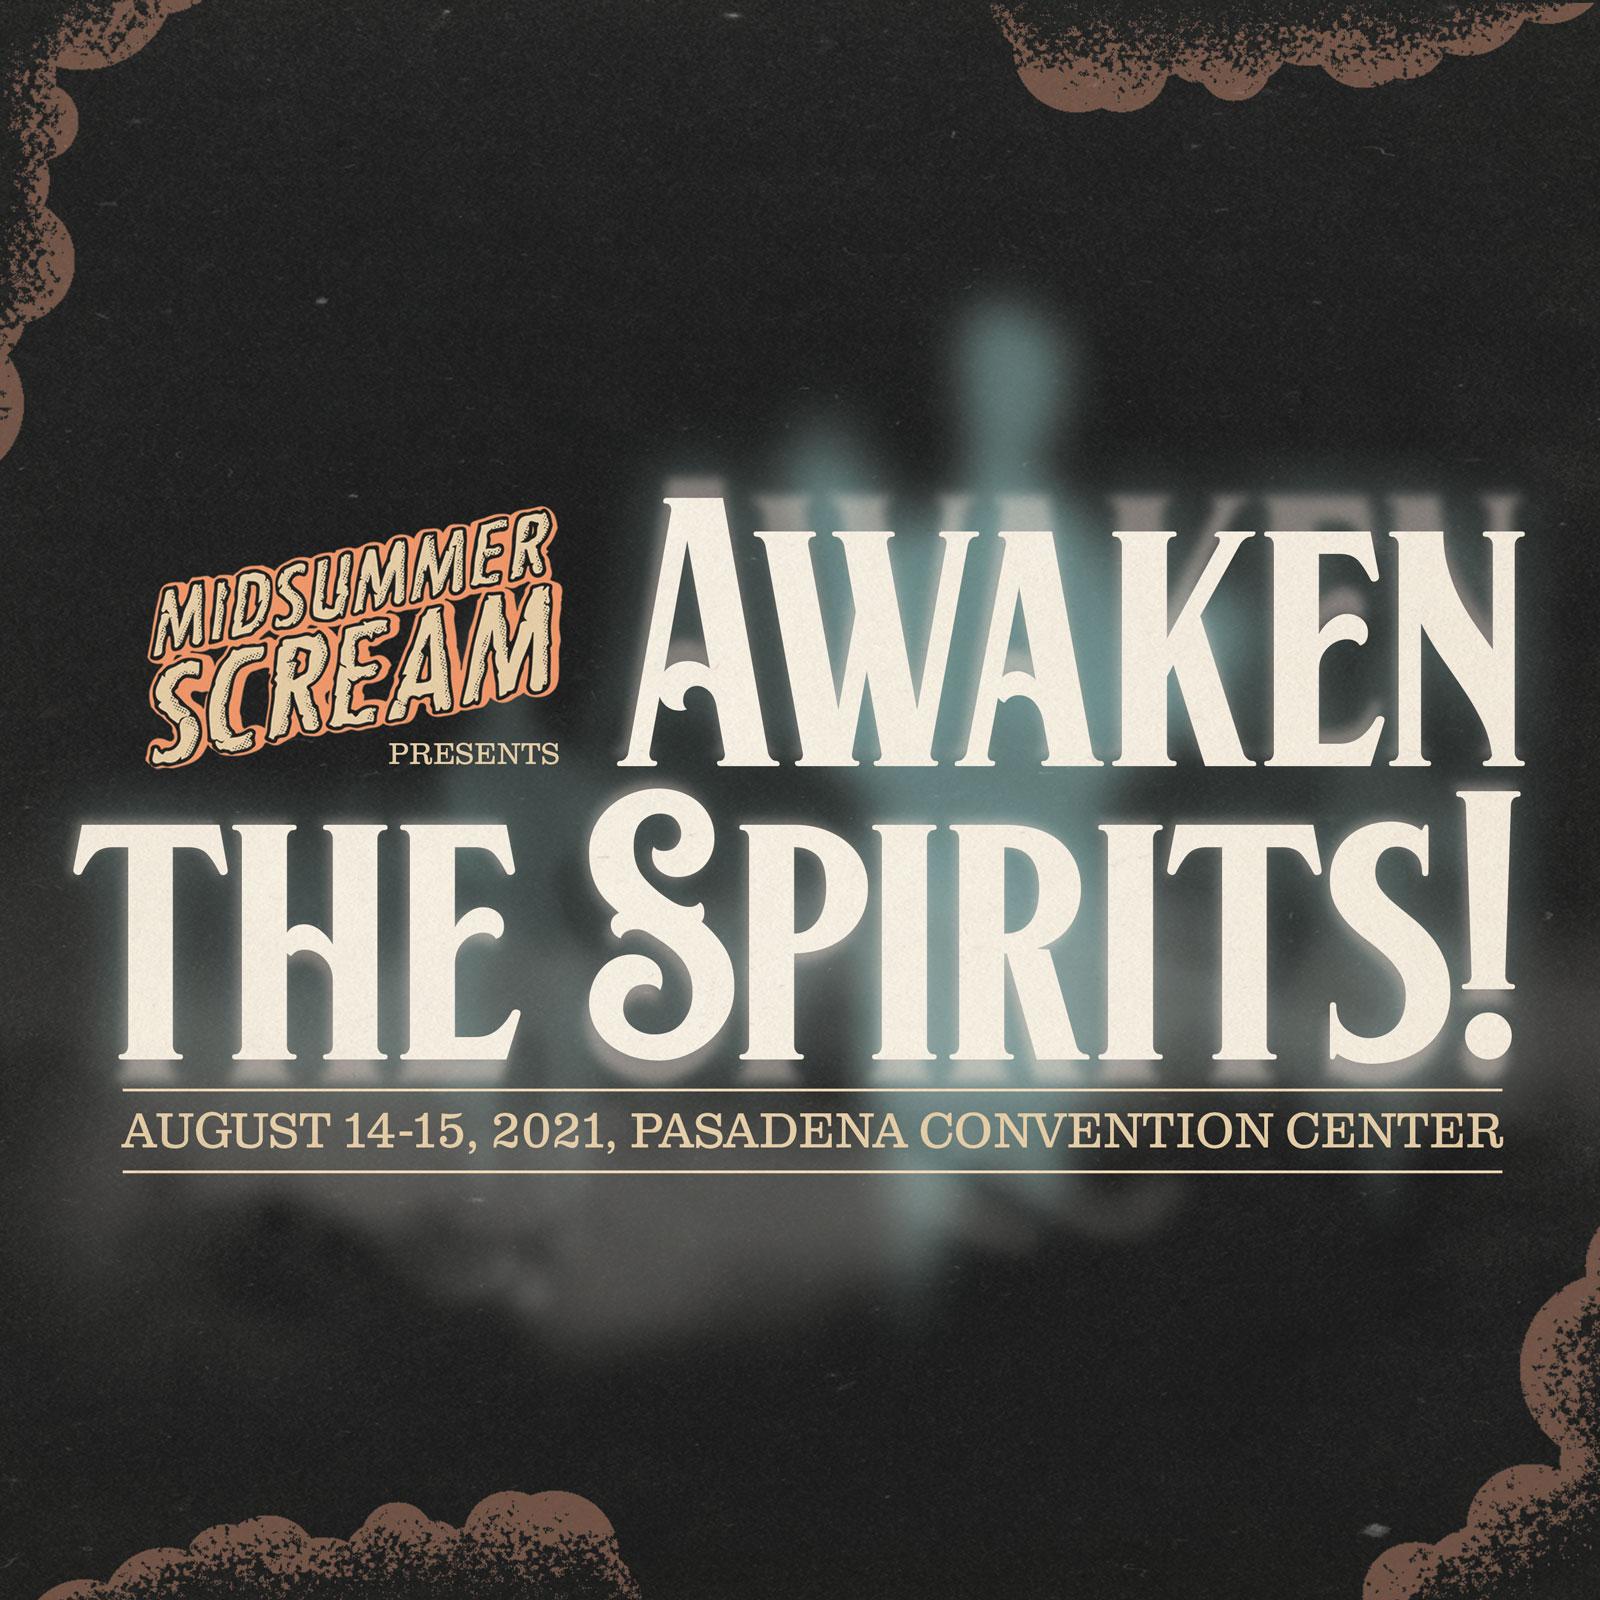 Awaken the Spirits!